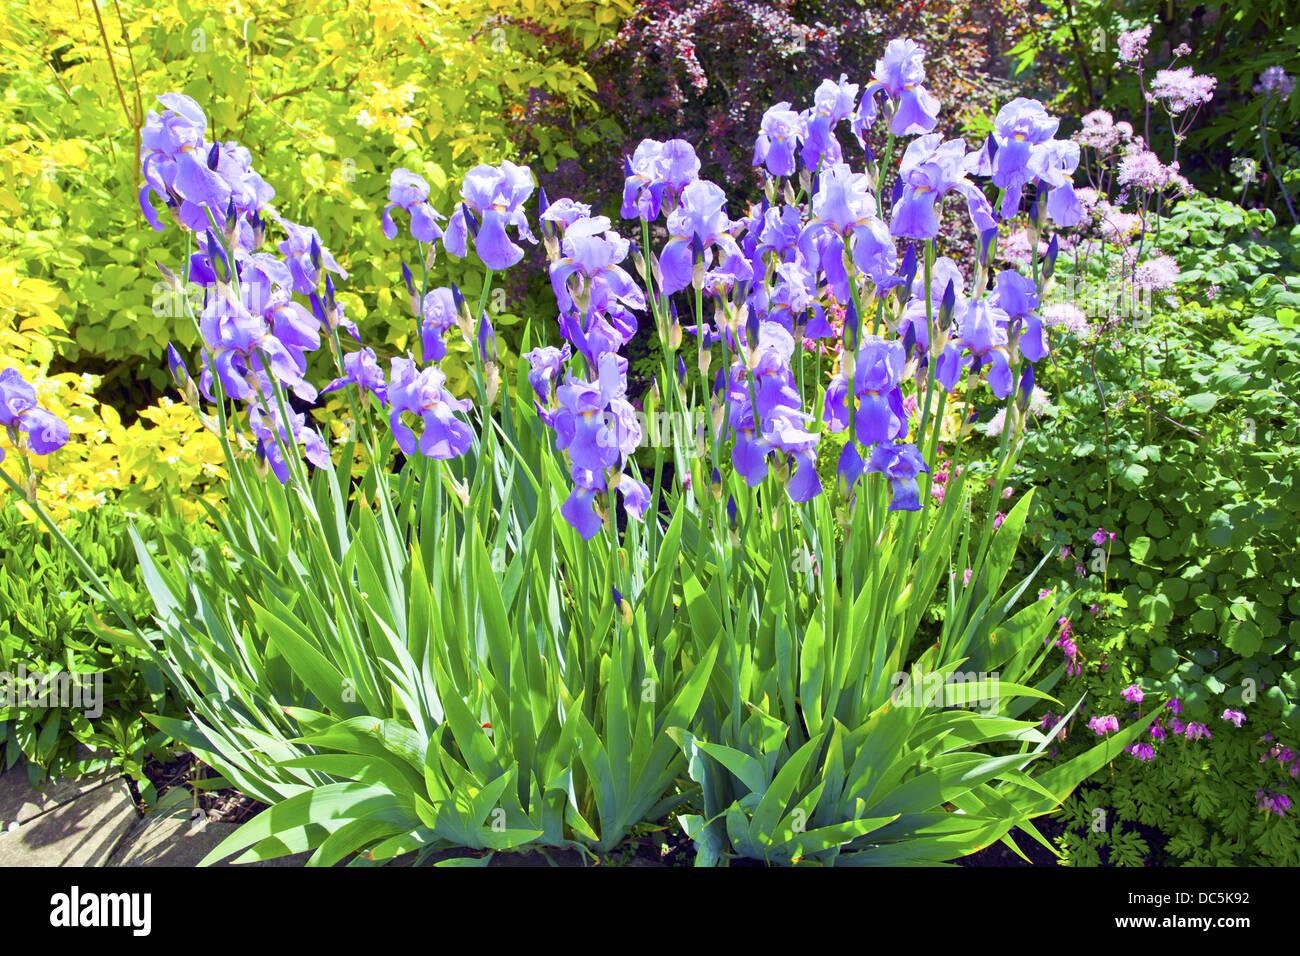 Flowering blue iris plants in a garden. - Stock Image